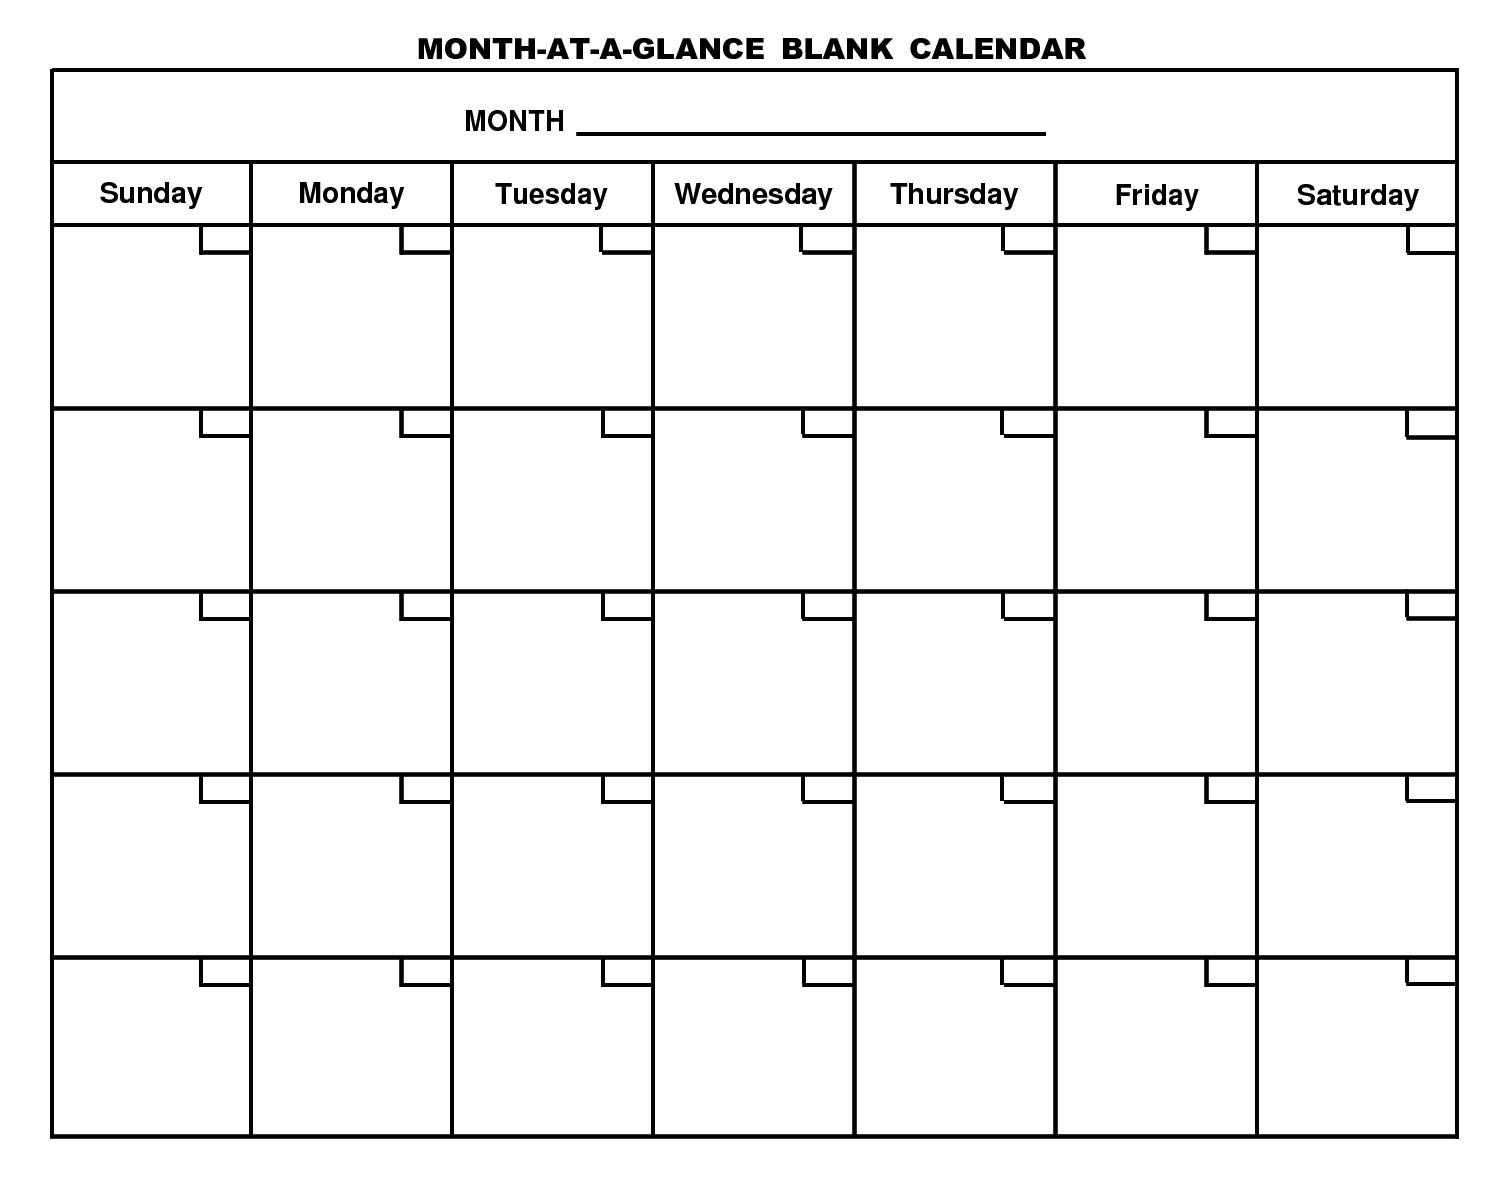 doc calendar templates in word word calendar template calendar template word 2014 2014 calendar templates 2014 calendar templates in word